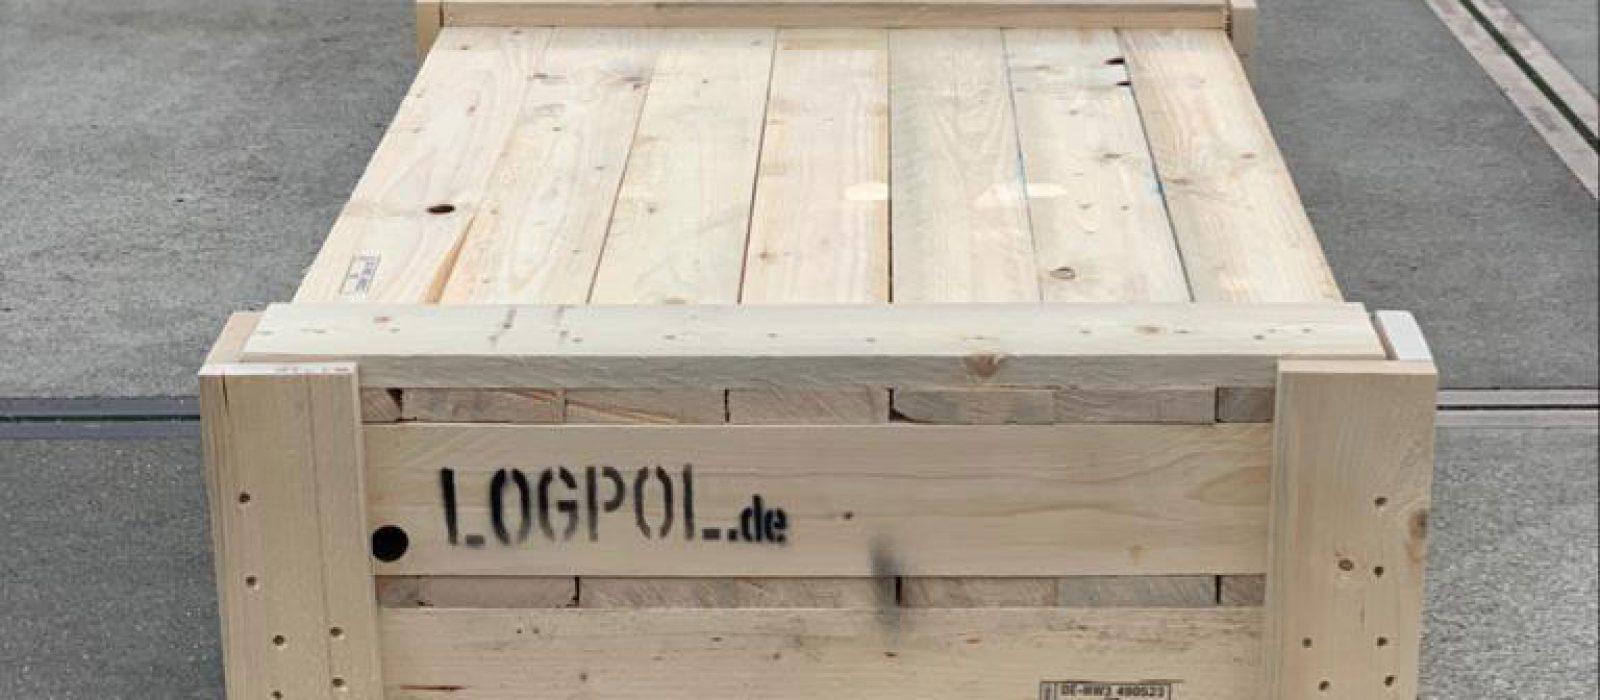 Holzkiste_2000x800x100_mm_LOGPOL